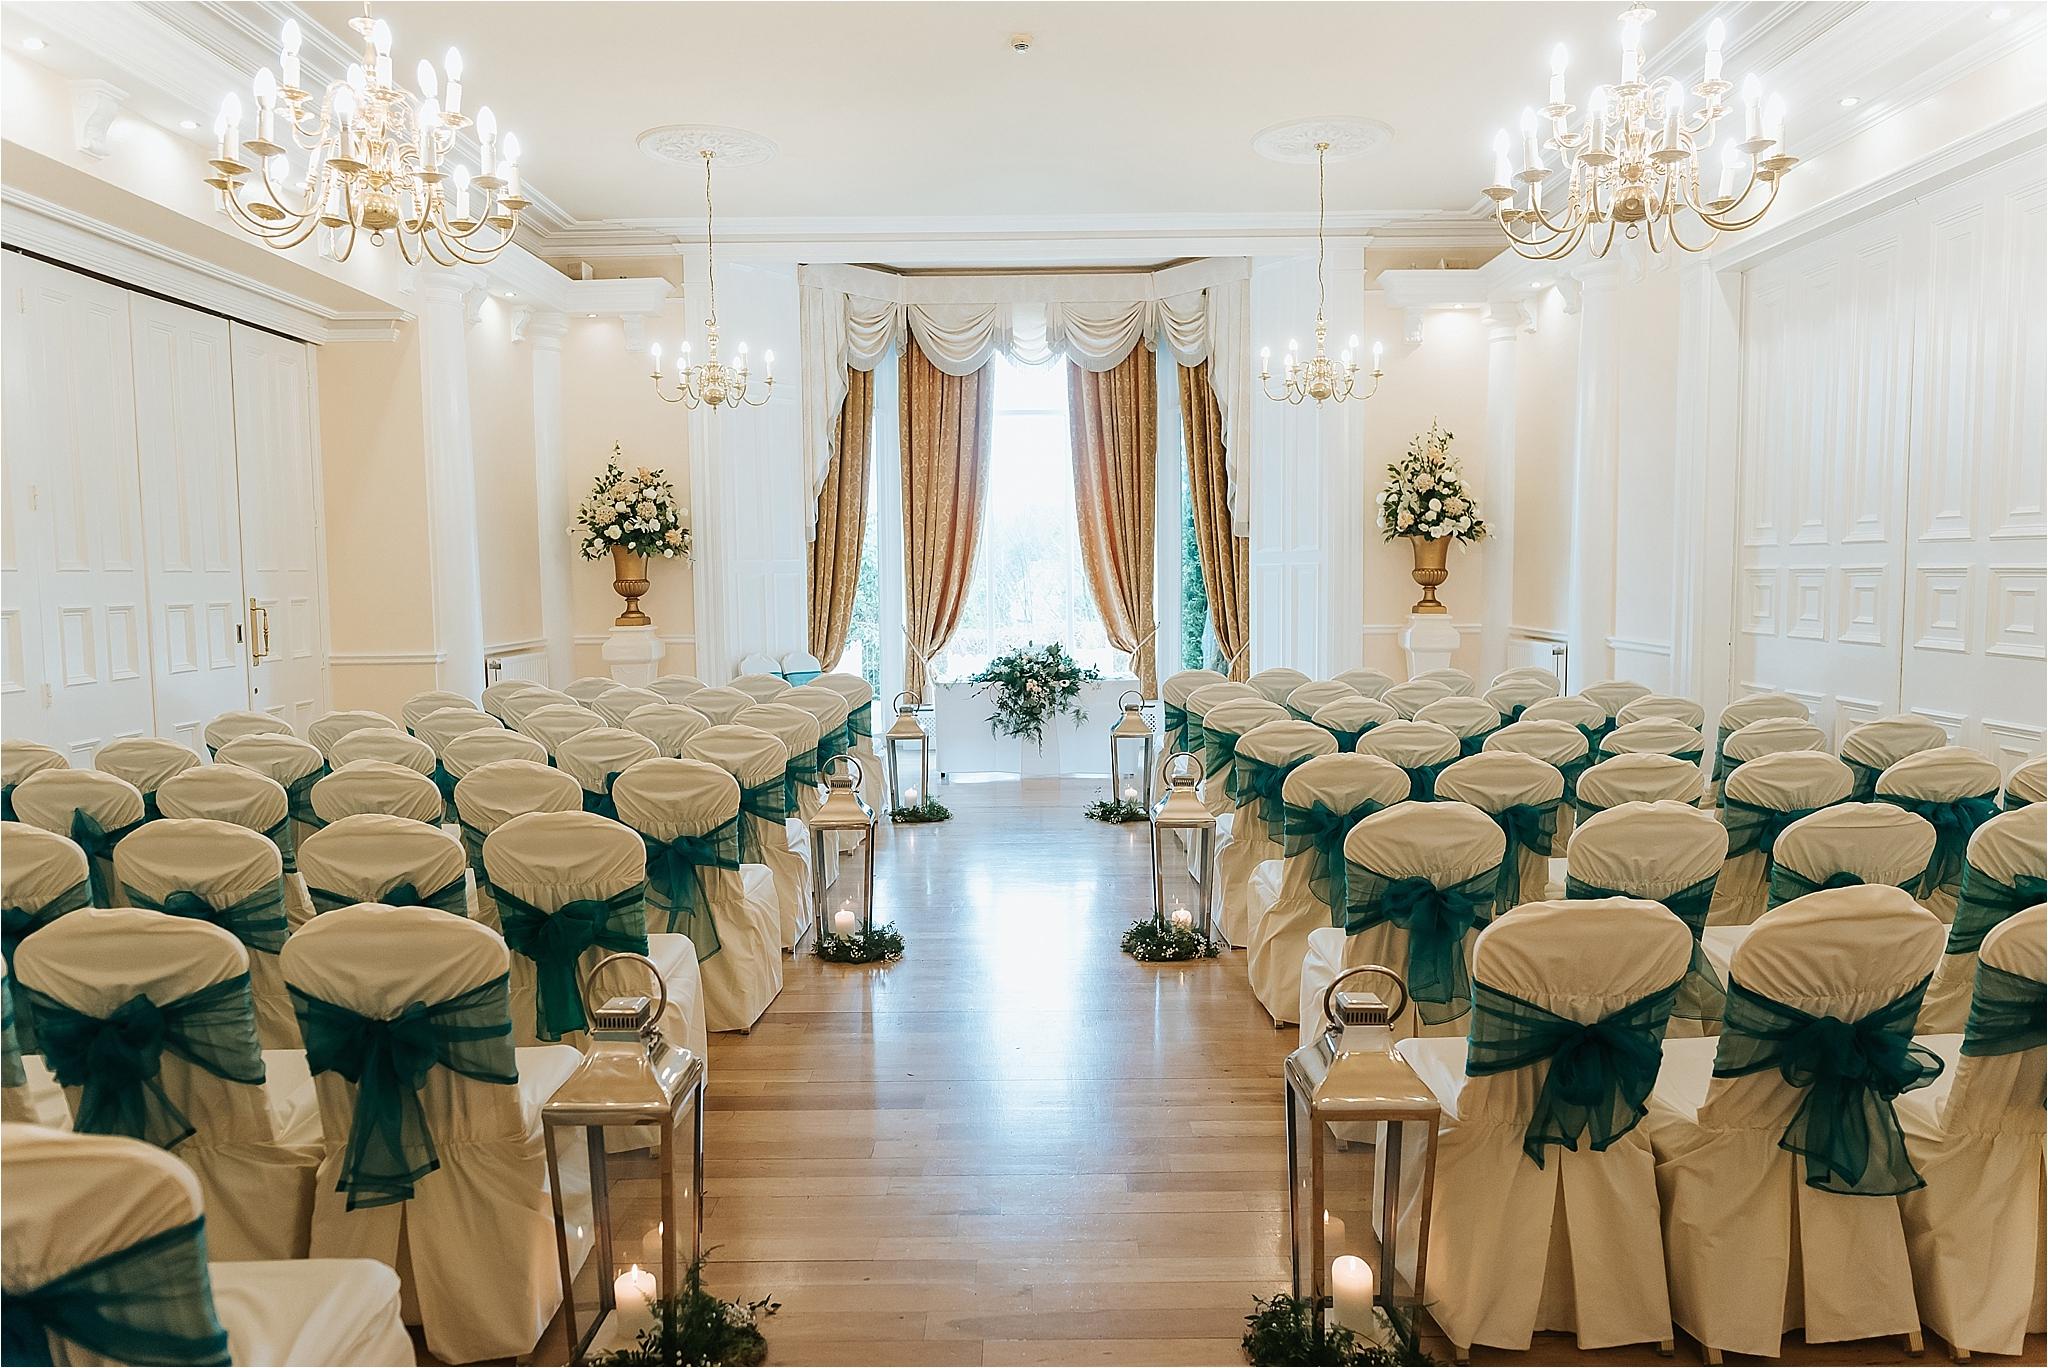 ceremony room set up for wedding at the grange hotel